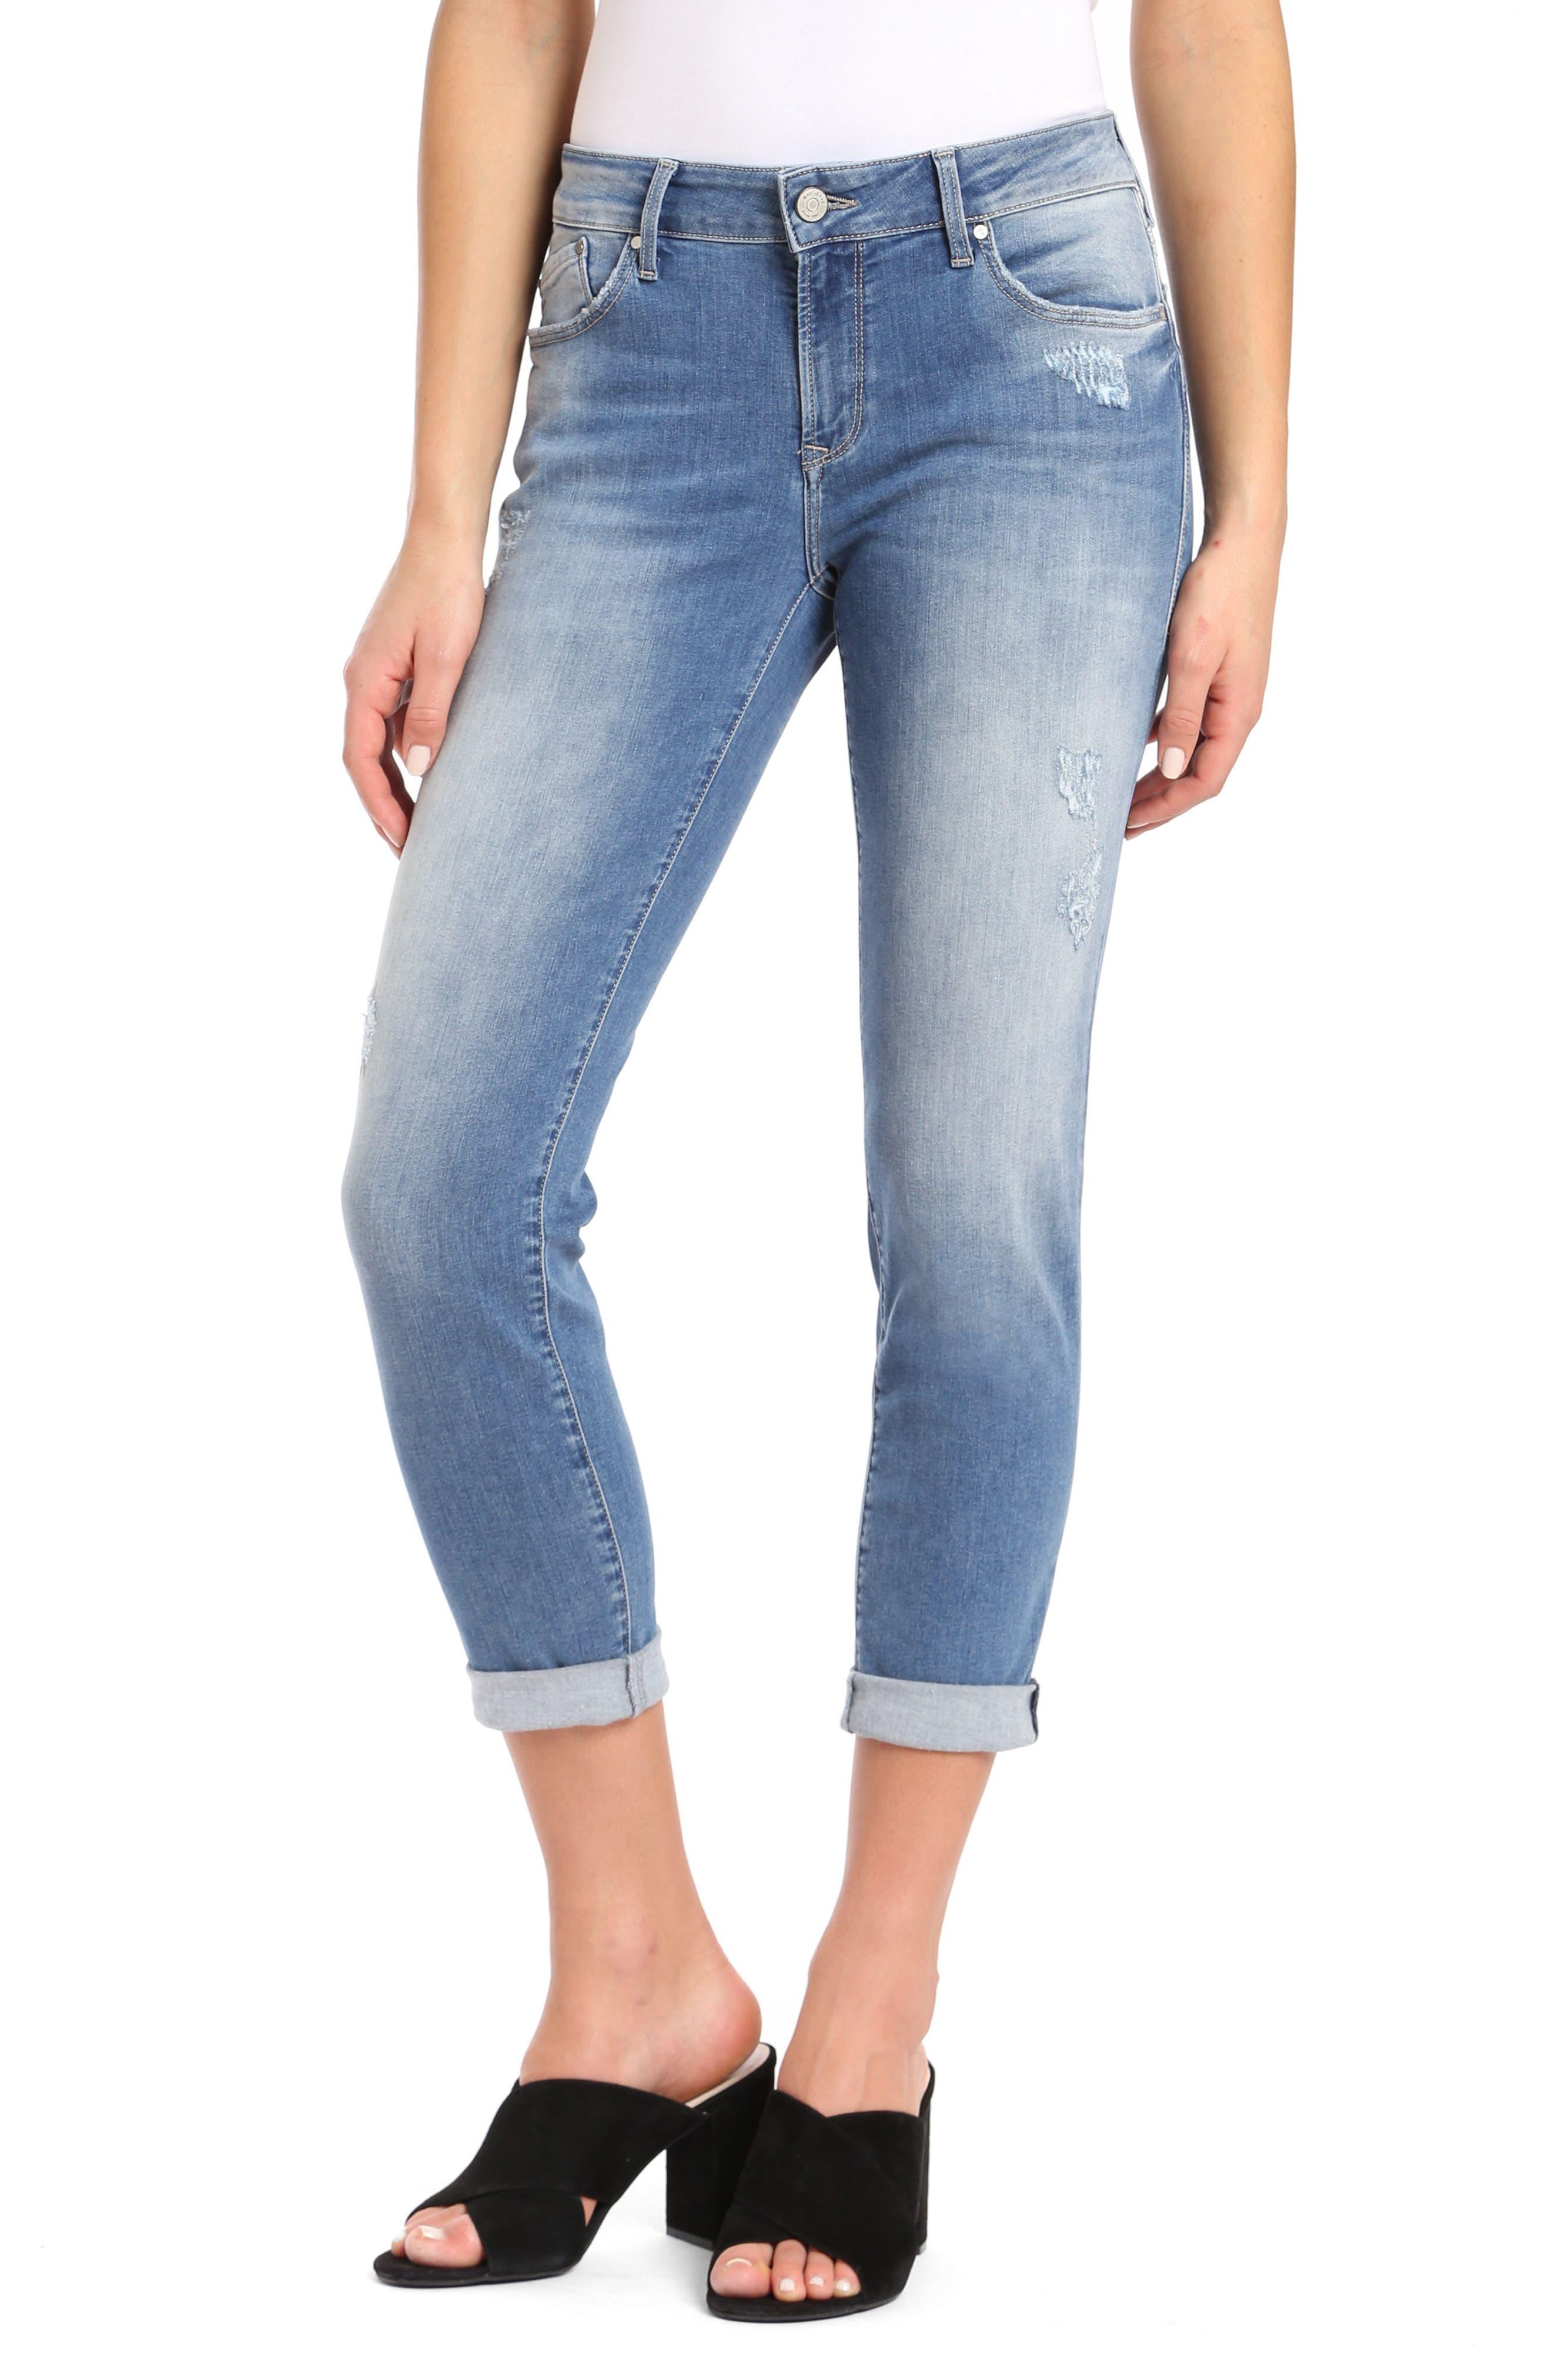 Leg Straight Mavi Nordstrom Jeans Women's q0zxFwtWP